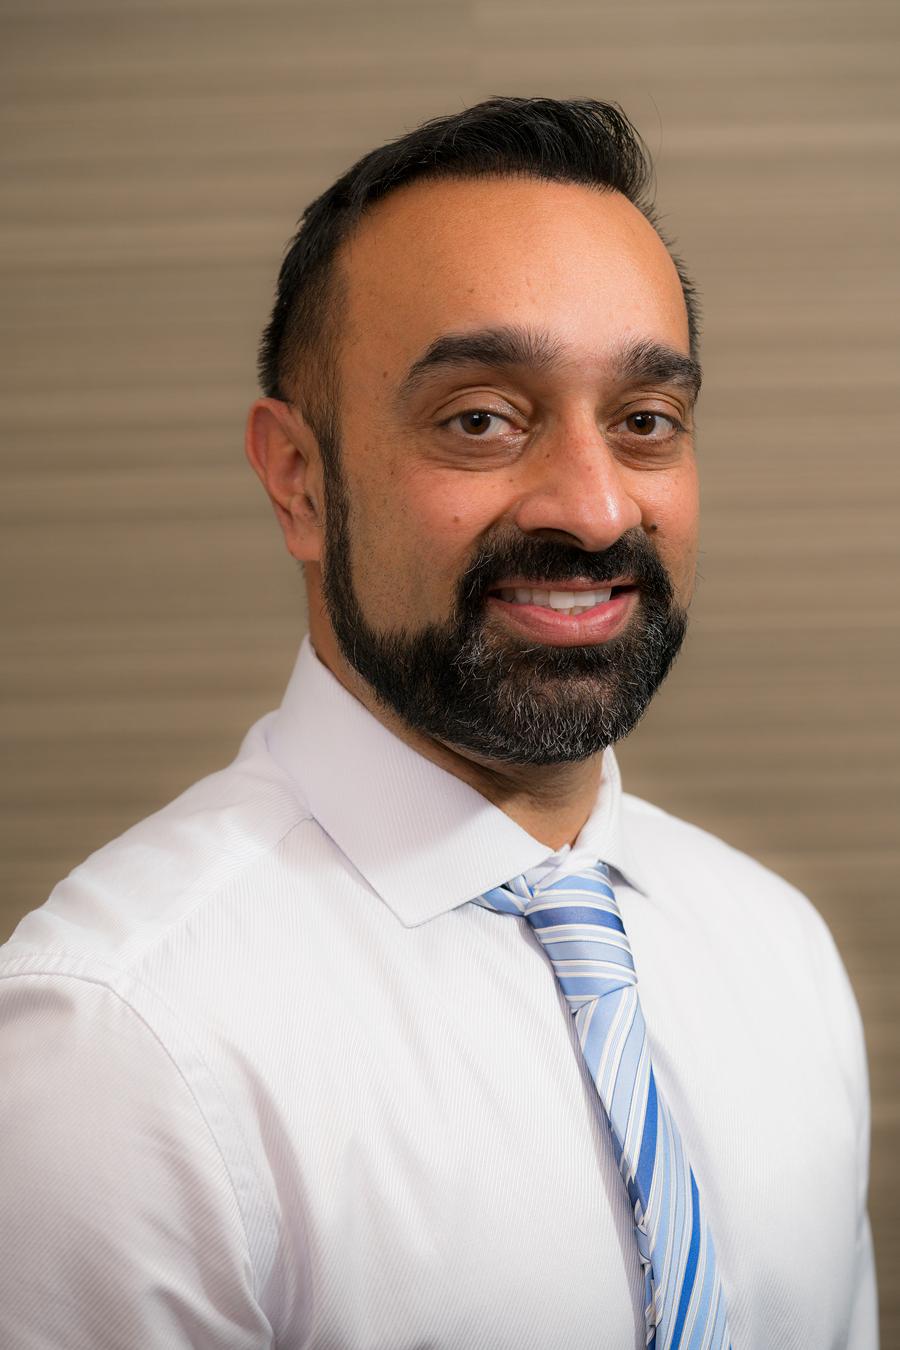 Dr. Raj Hundal Abbotsford Family Dentist